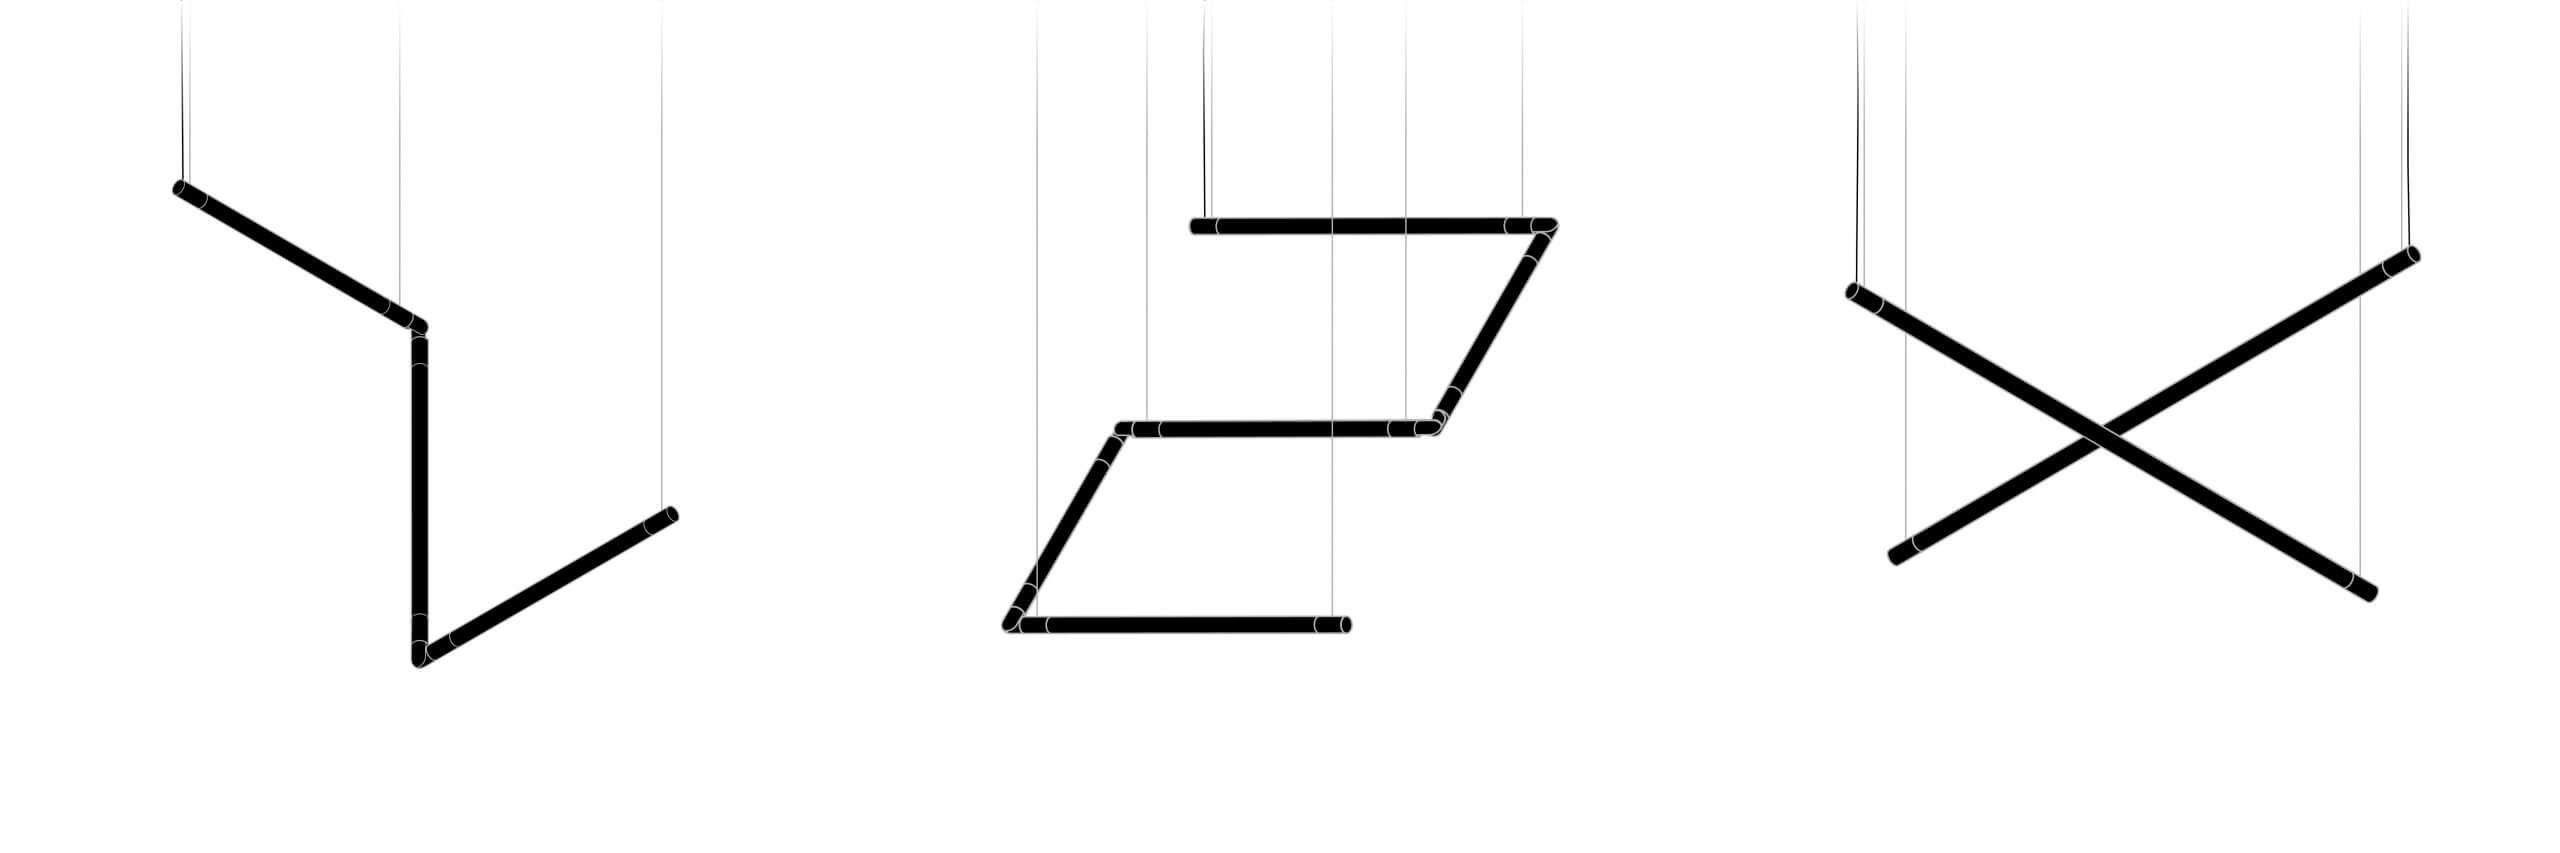 Configurations_3